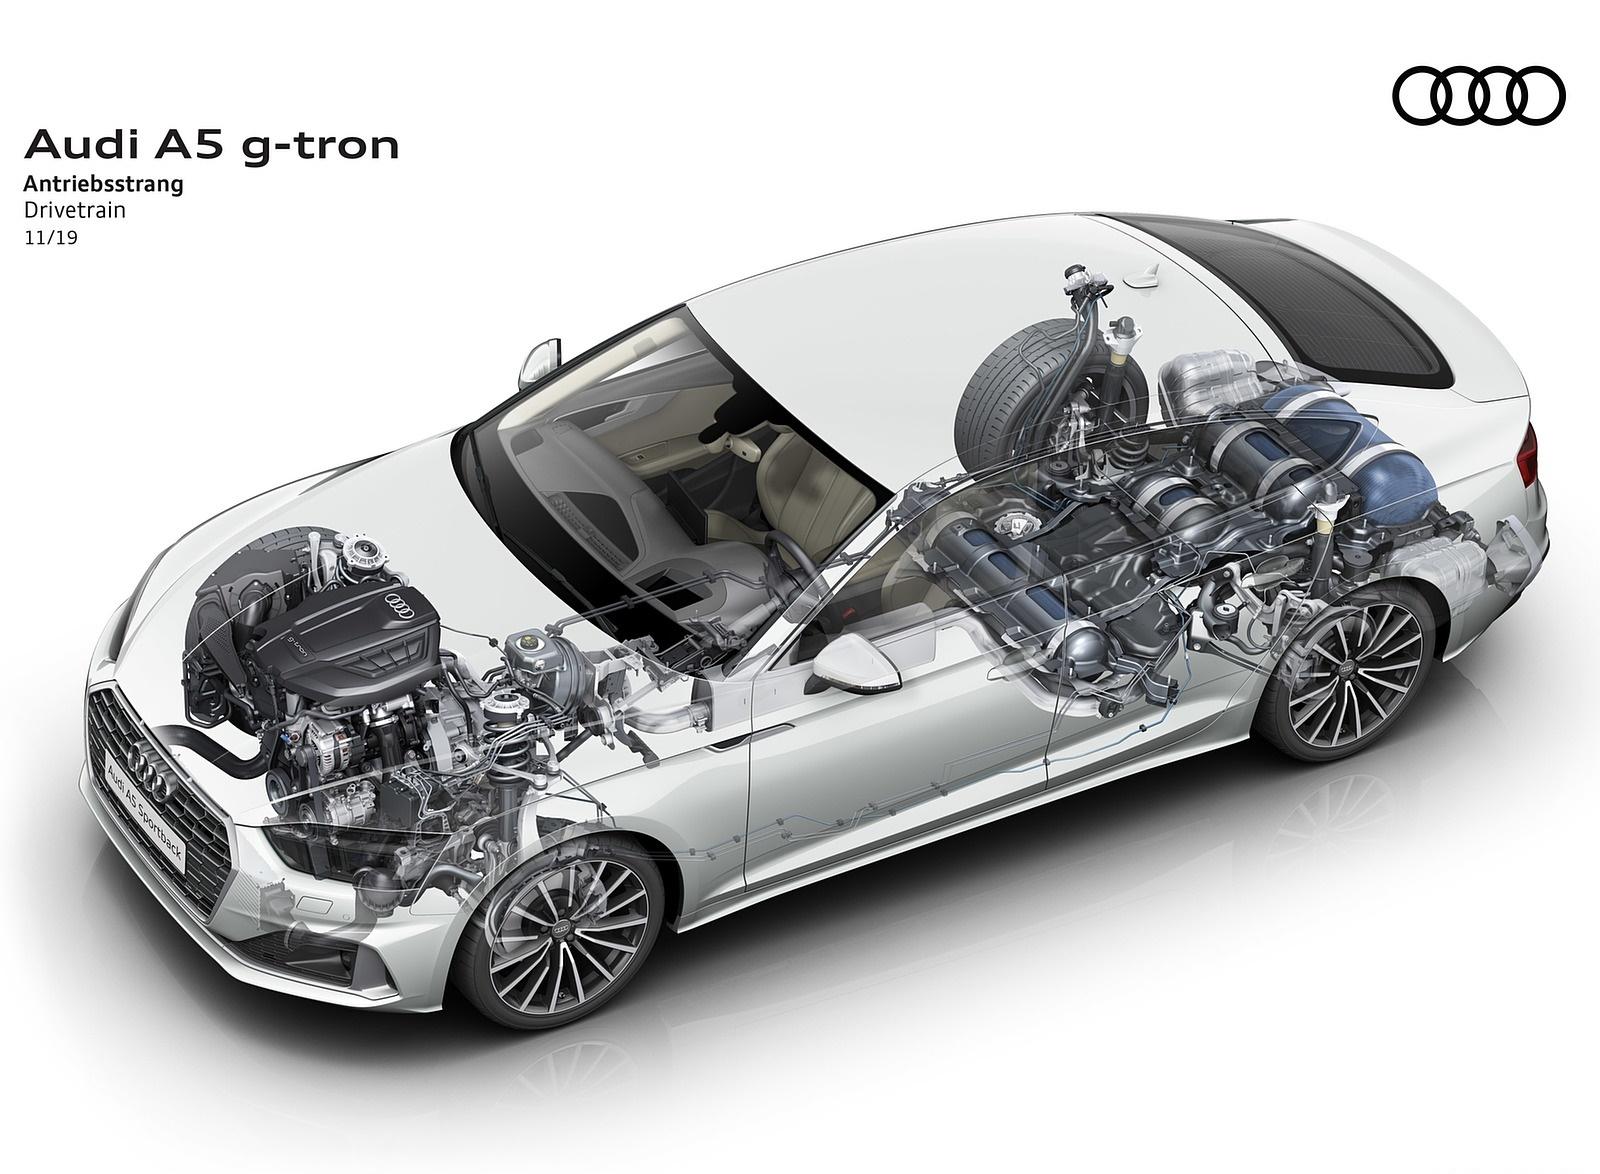 2020 Audi A5 Sportback g-tron Drivetrain Wallpapers (8)